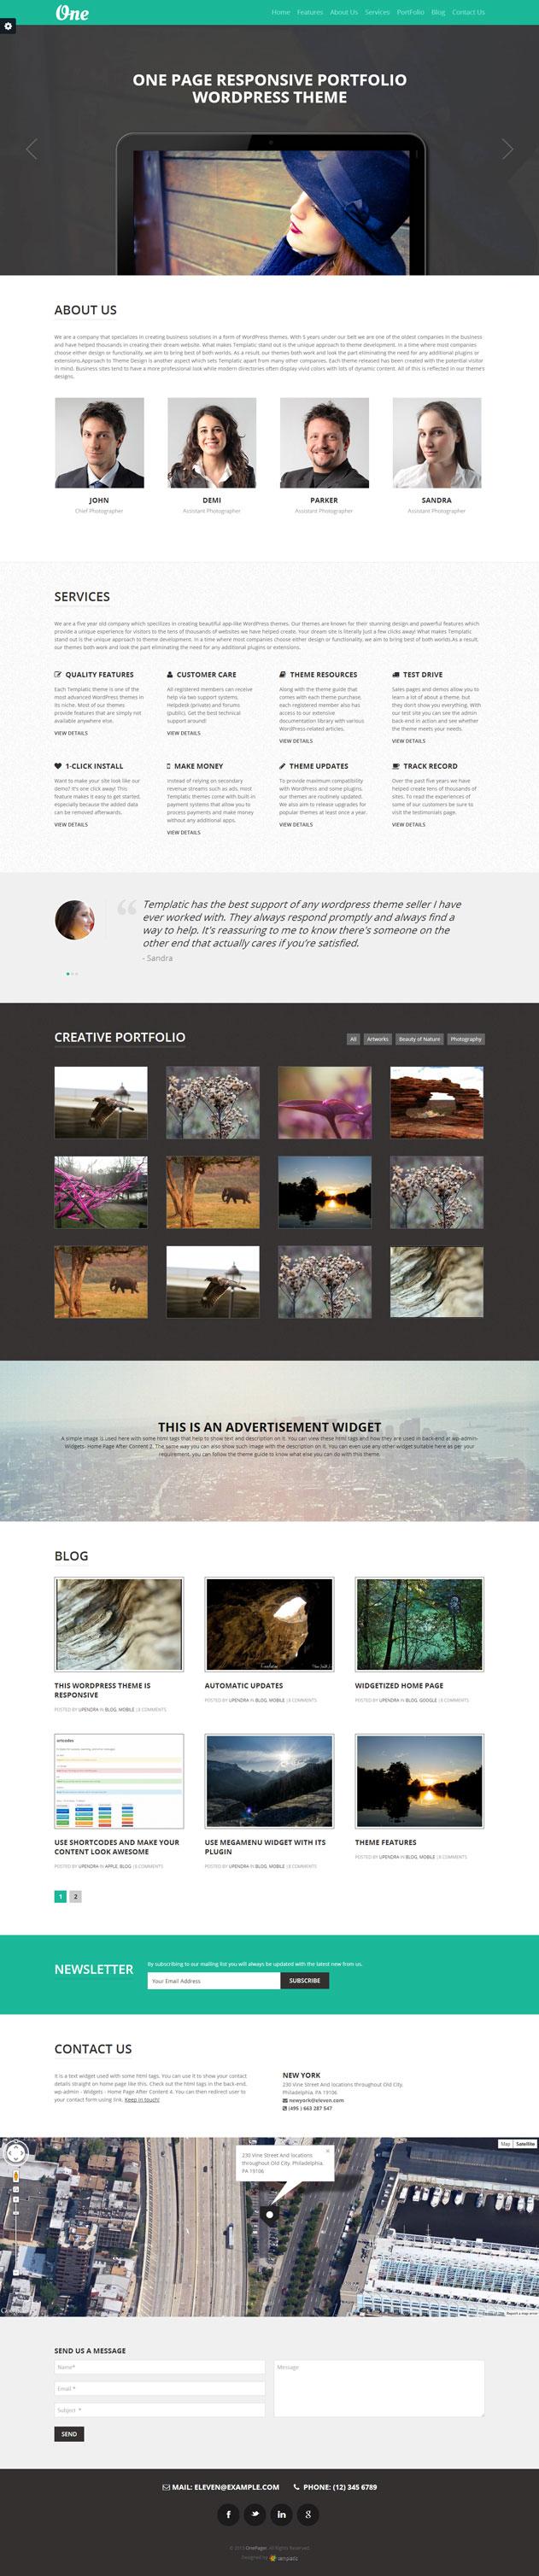 one-page-responsive-portfolio-theme